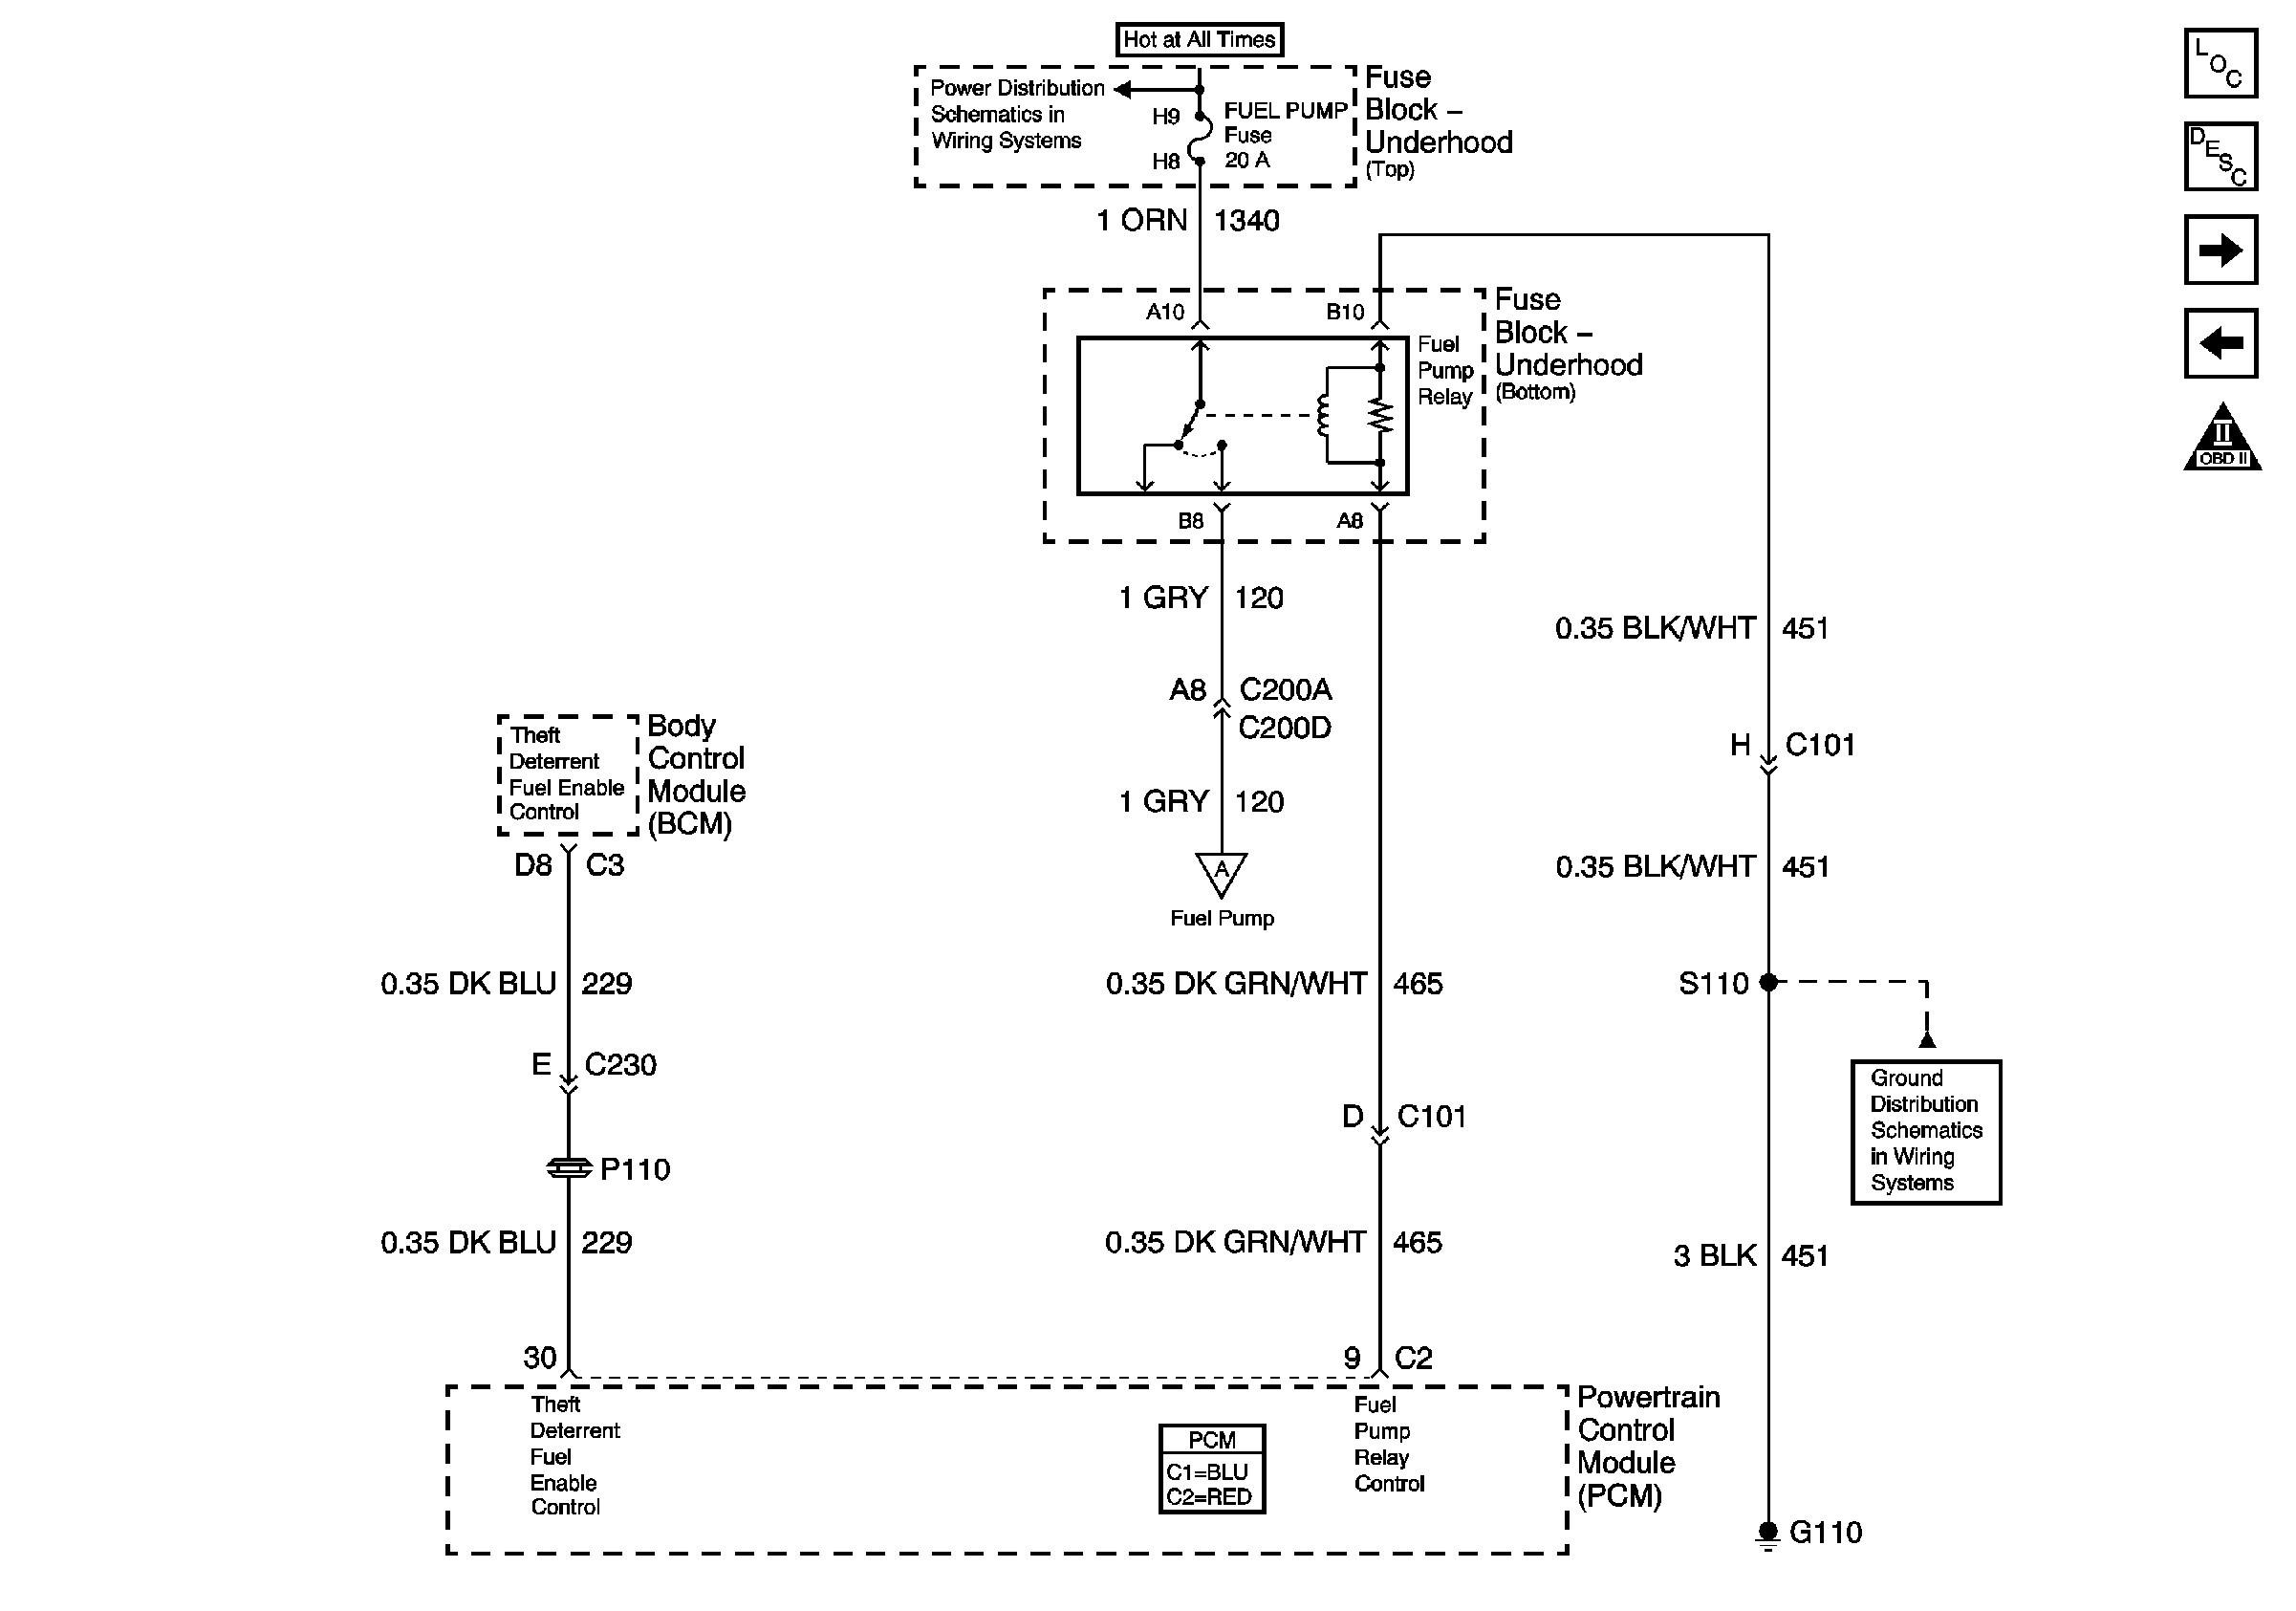 Miata Wiring Diagram | Wiring Diagram Image